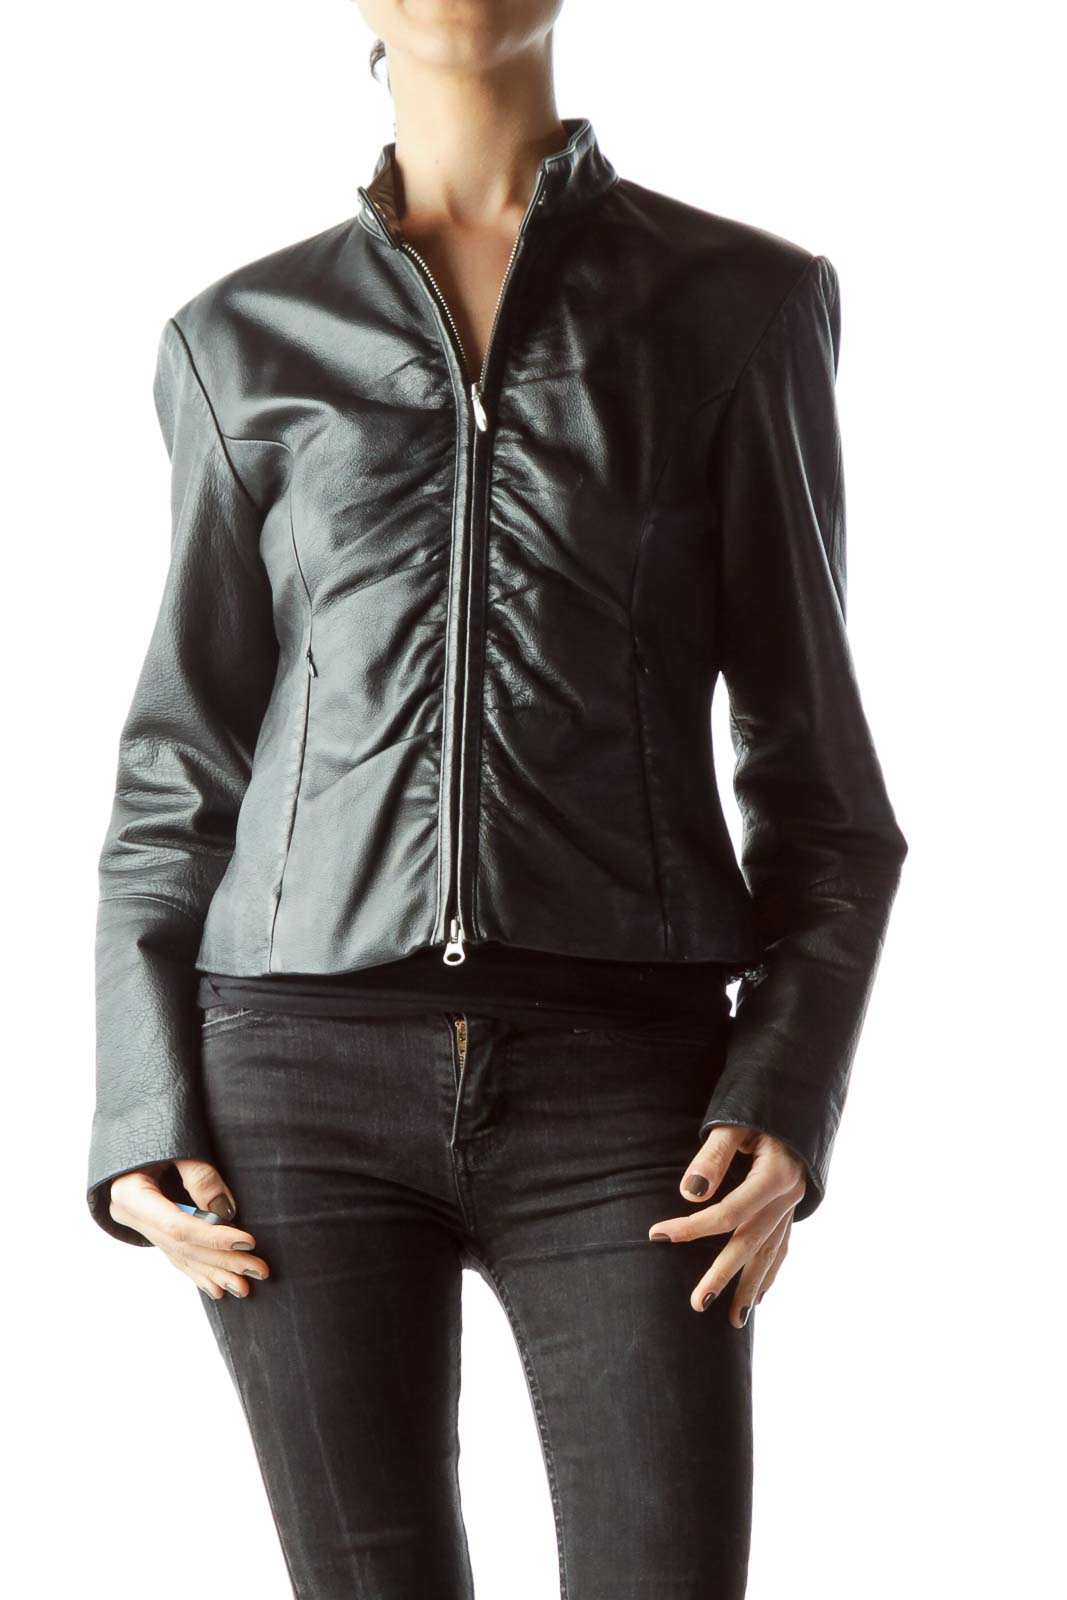 Black Zippered Leather Jacket Front